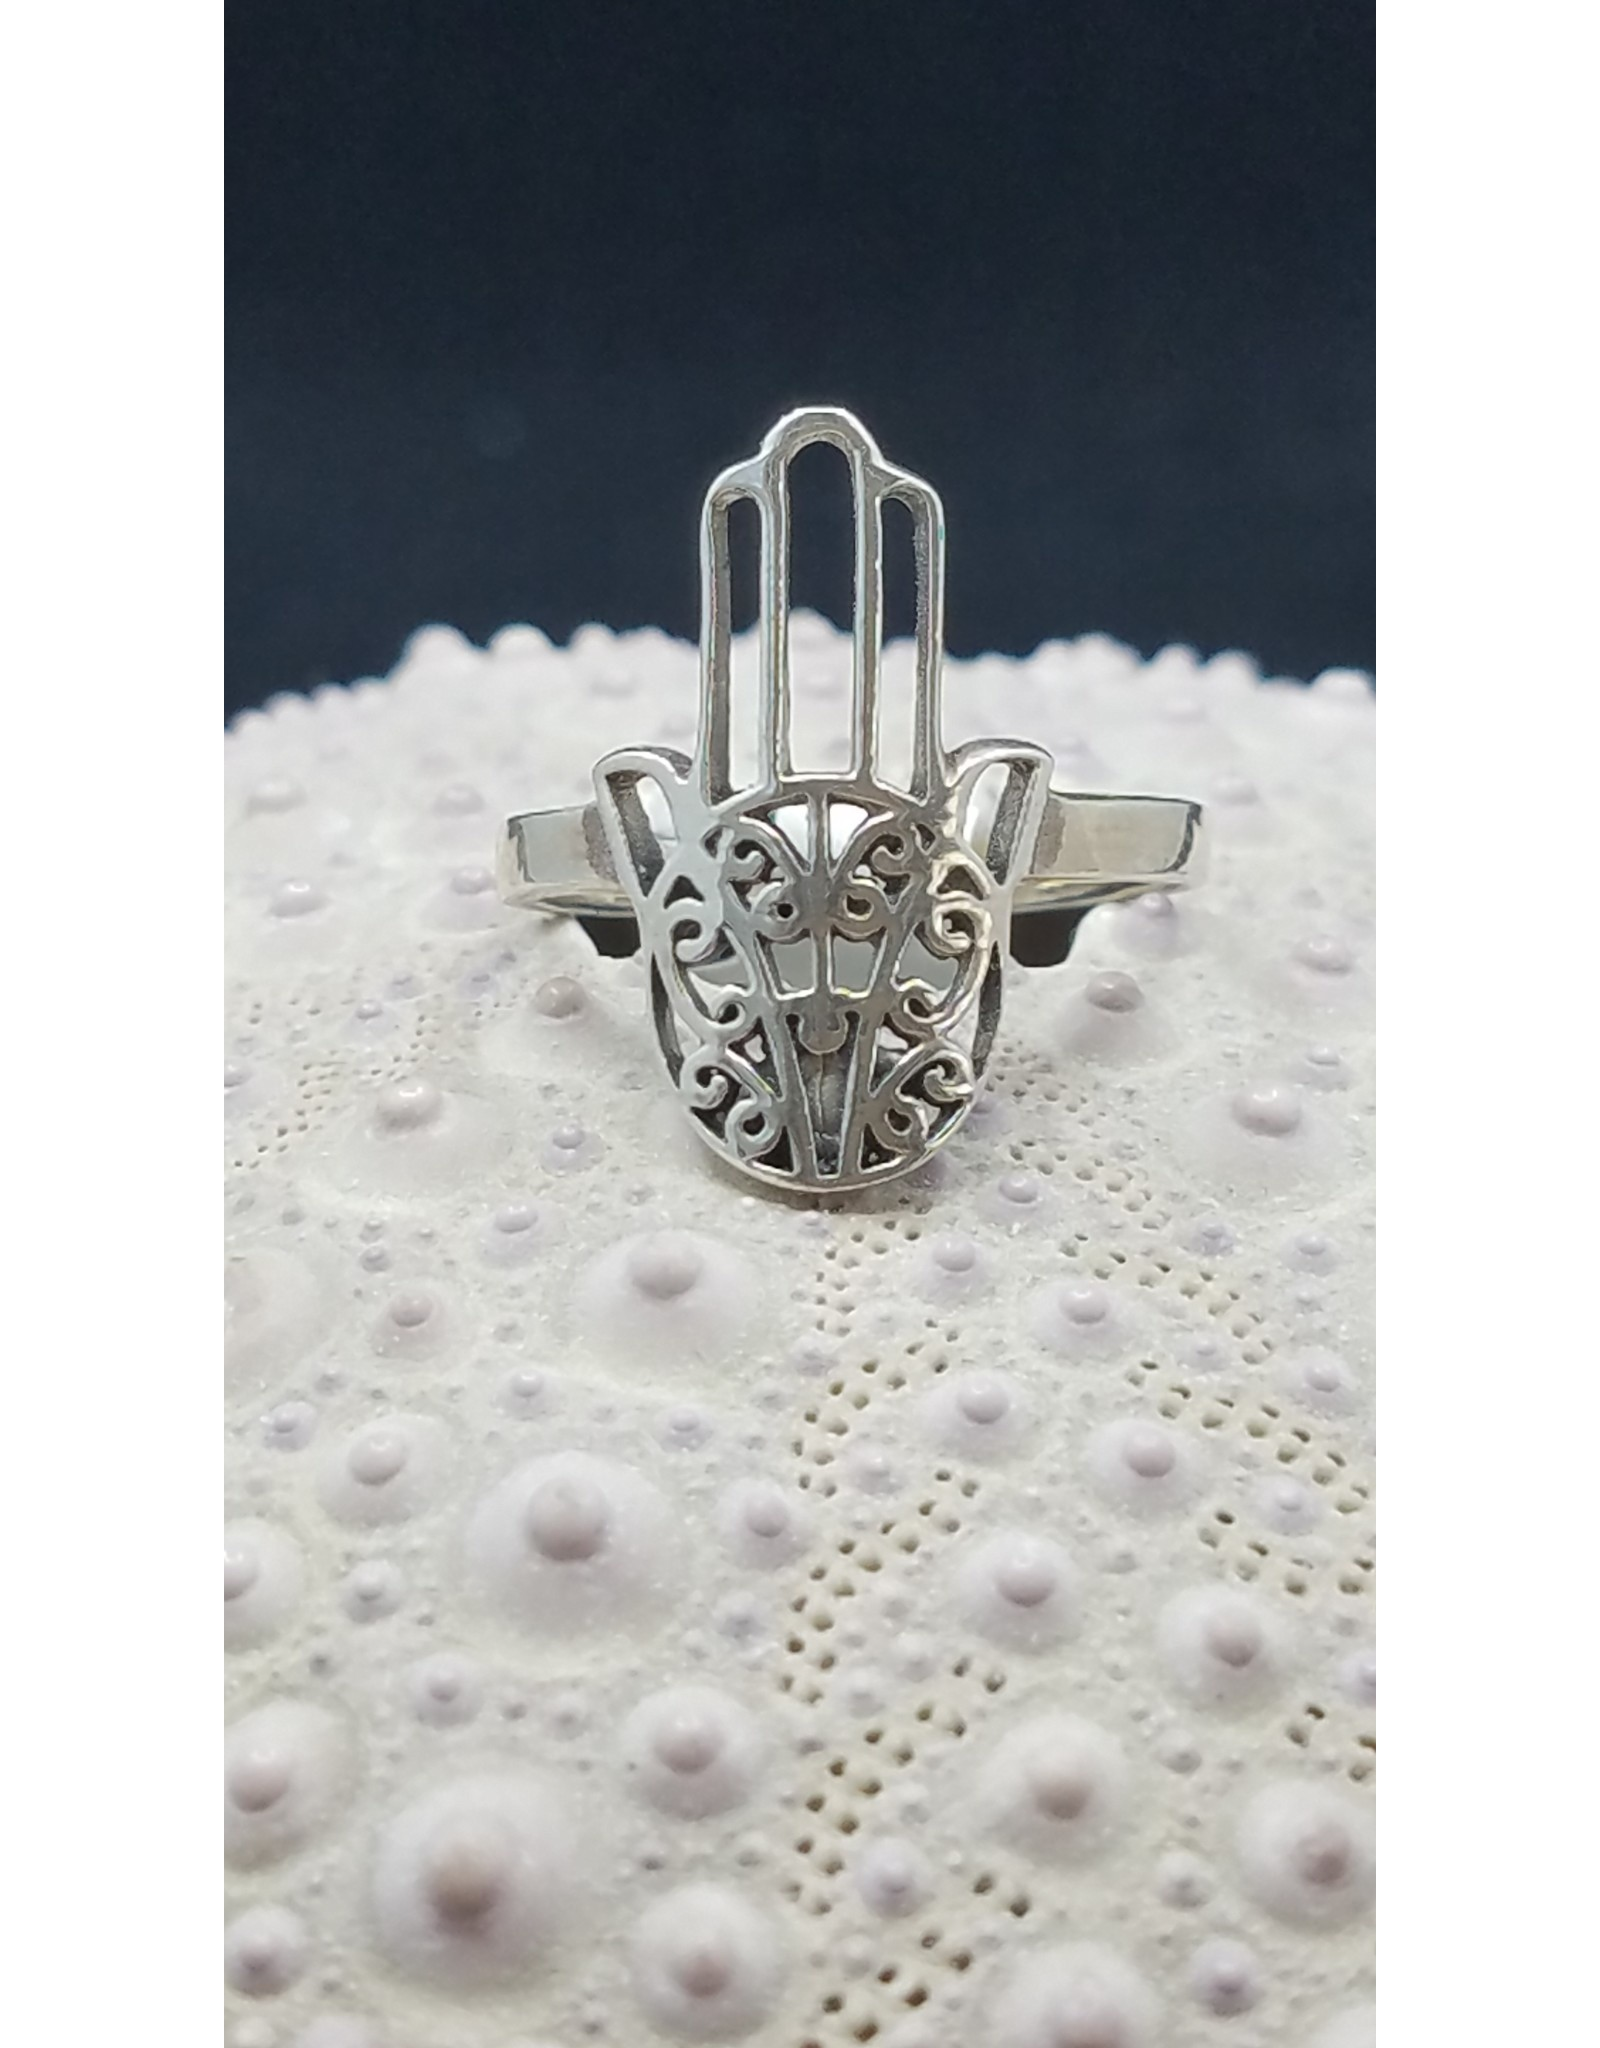 Hamsa Hand Ring - Size 6.5